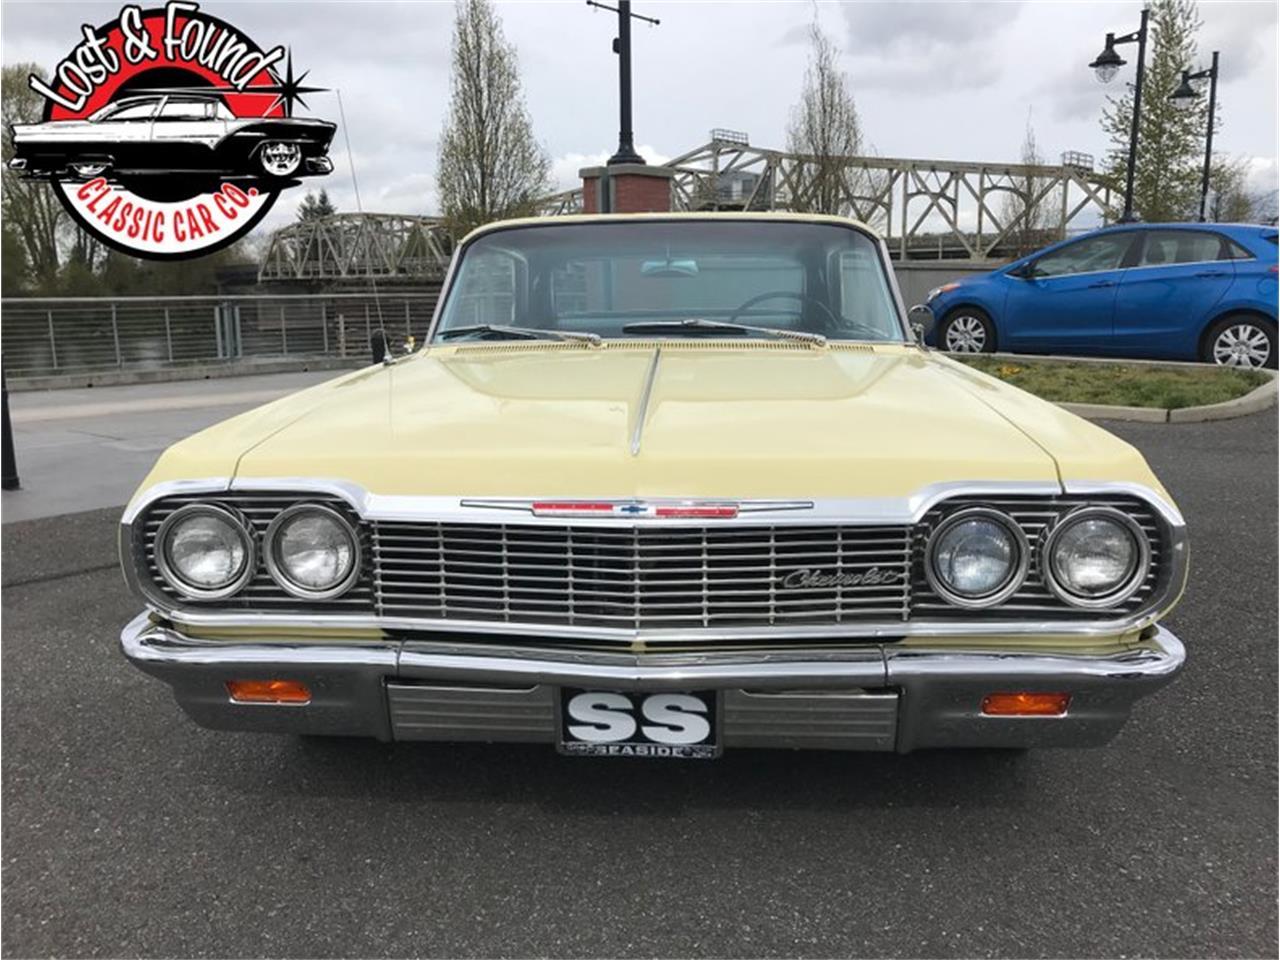 1964 Chevrolet Impala (CC-1251271) for sale in Mount Vernon, Washington